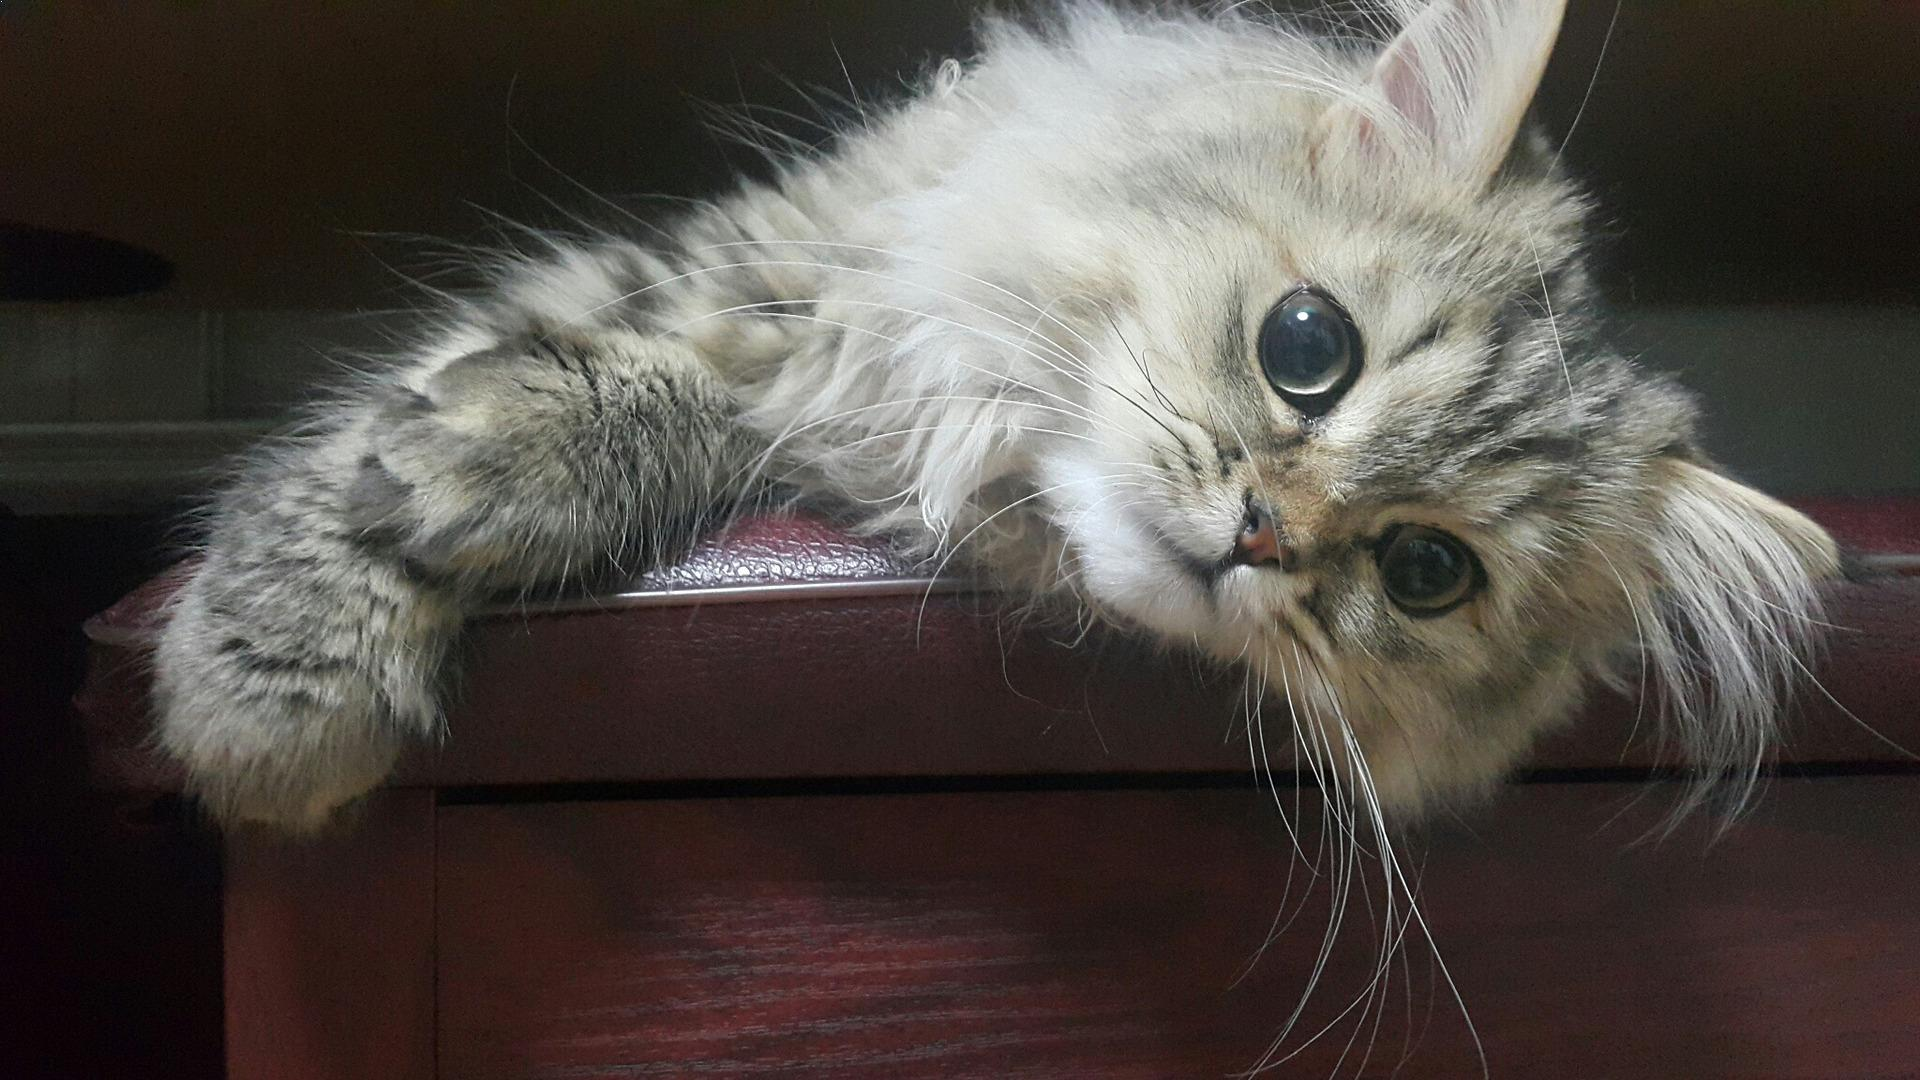 cat in pepe le pew